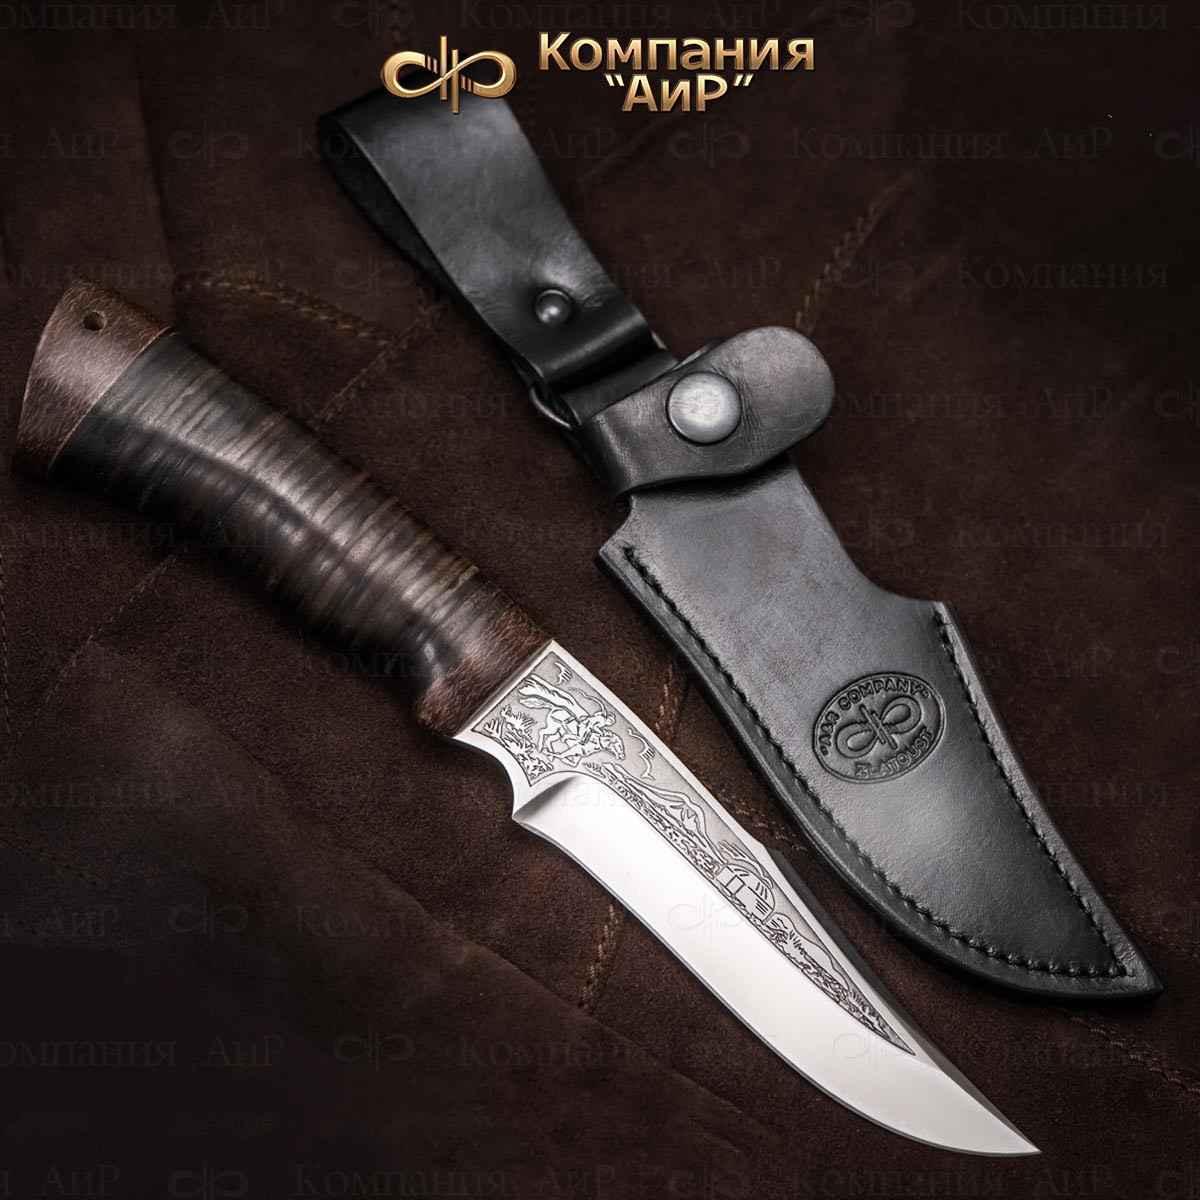 Нож АиР Хазар, сталь М390, рукоять кожа